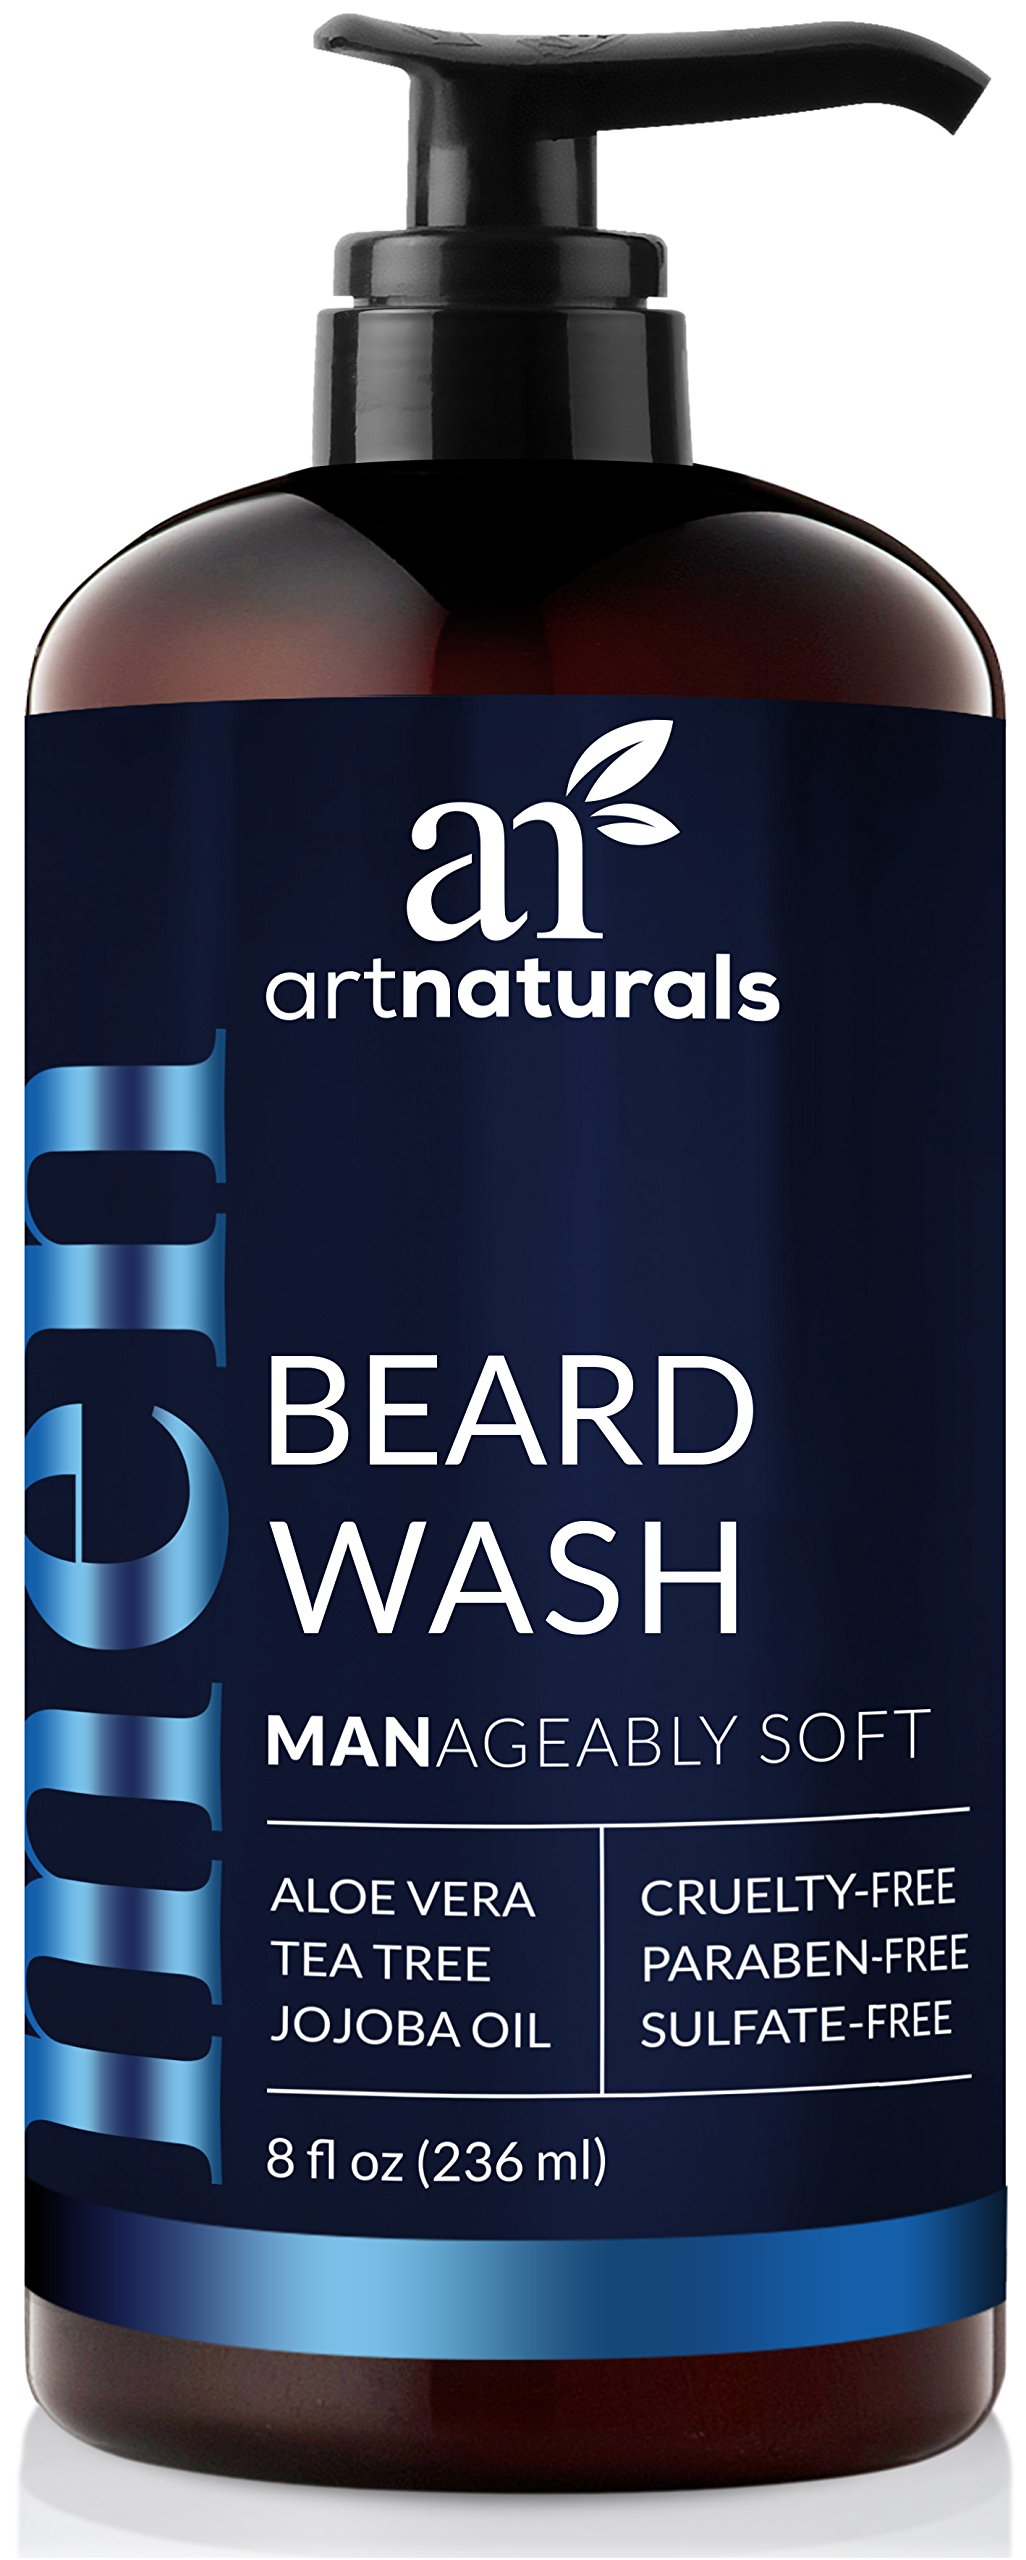 ArtNaturals Natural Beard Shampoo Wash - (8 Fl Oz/236ml) - Infused with Aloe Vera, Tea Tree and Jojoba Oil - Sulfate Free